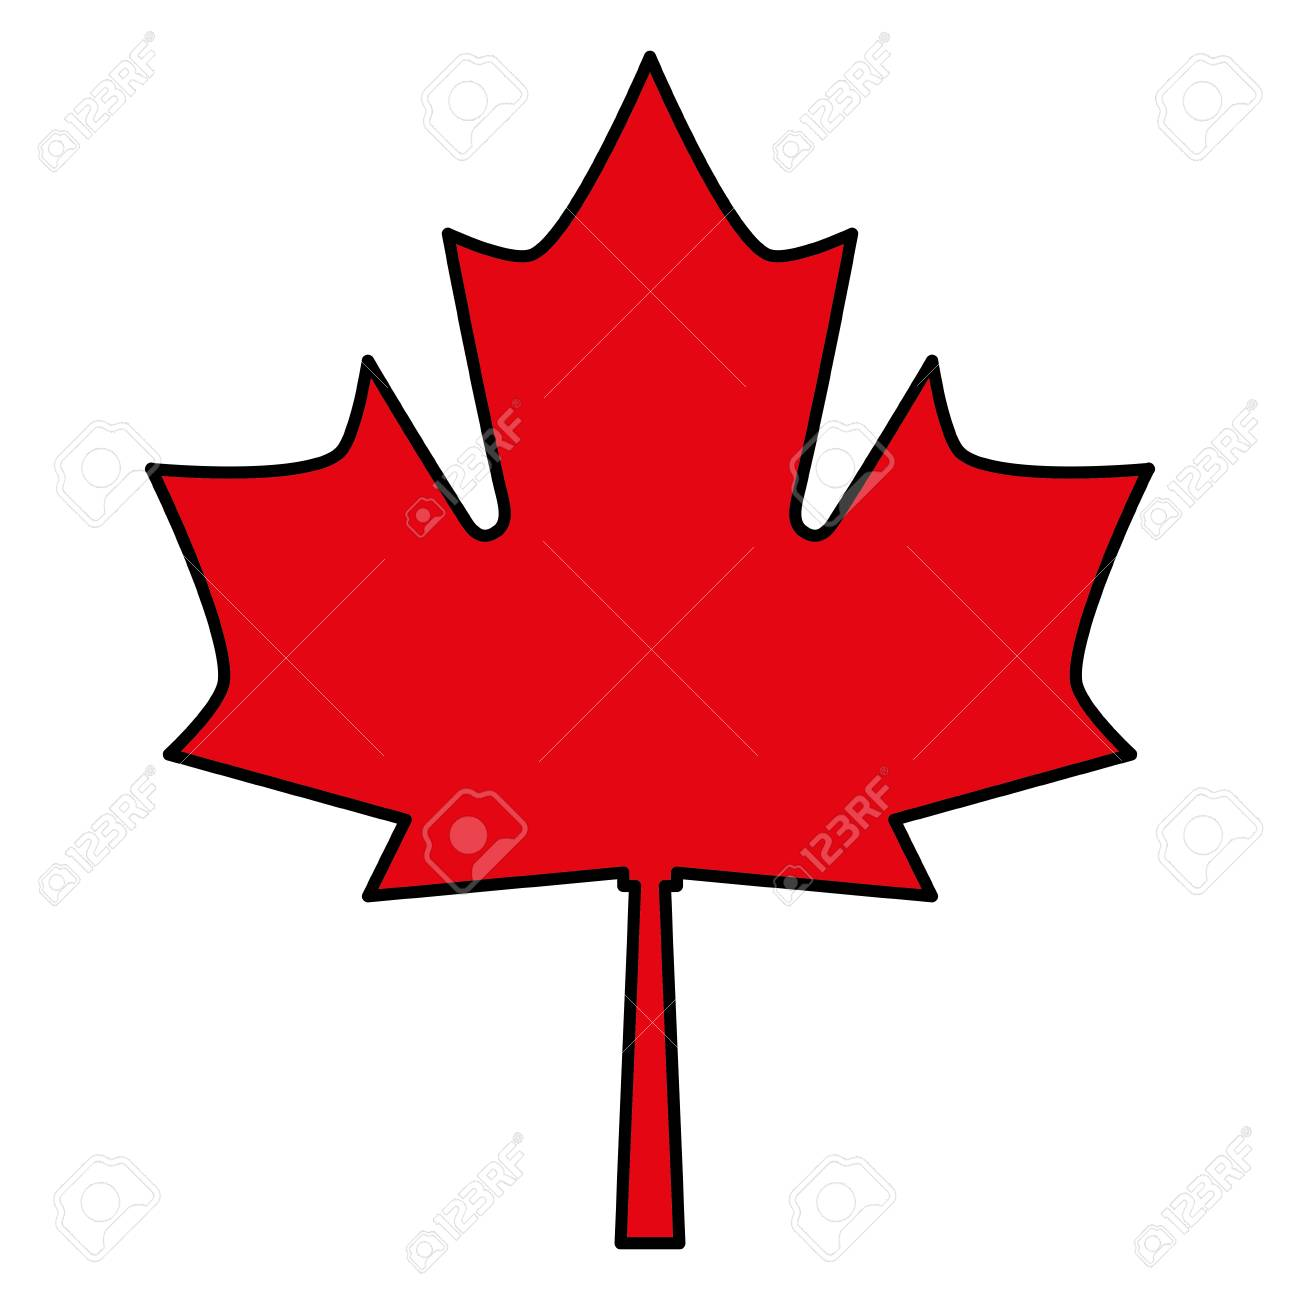 Red Maple Leaf Canadian Symbol Vector Illustration Royalty Free